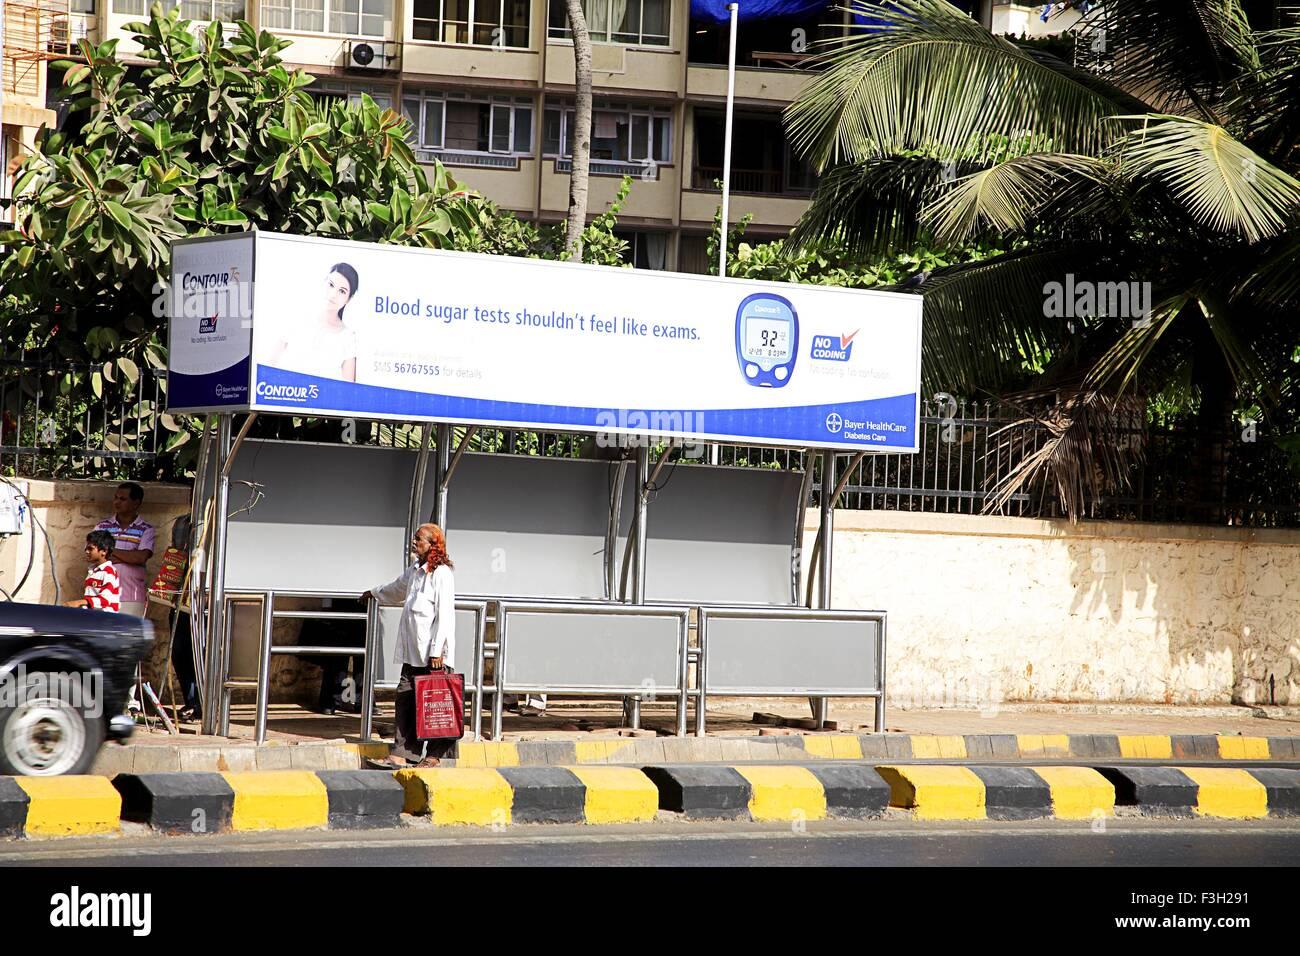 Werbung Horten Contour ts Blut Glukose monitoring System Bushaltestelle Bhulabhai Desai Road Warden Straße Stockbild